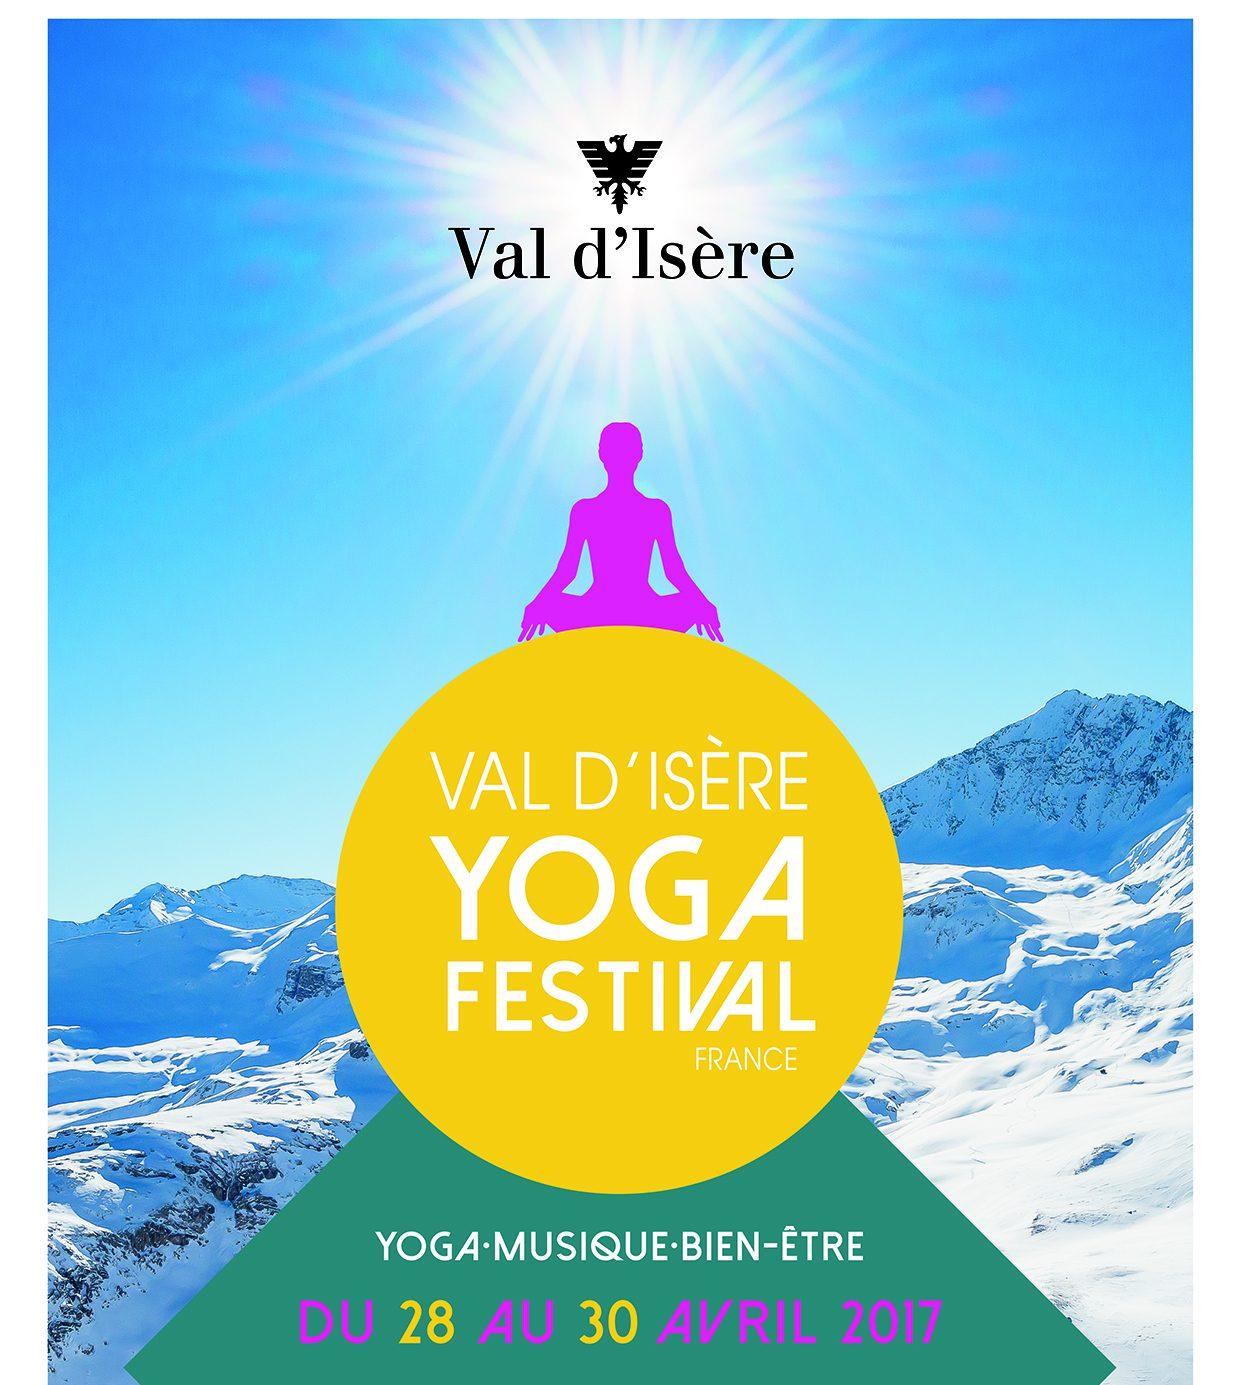 Festival de yoga de Val d'Isère